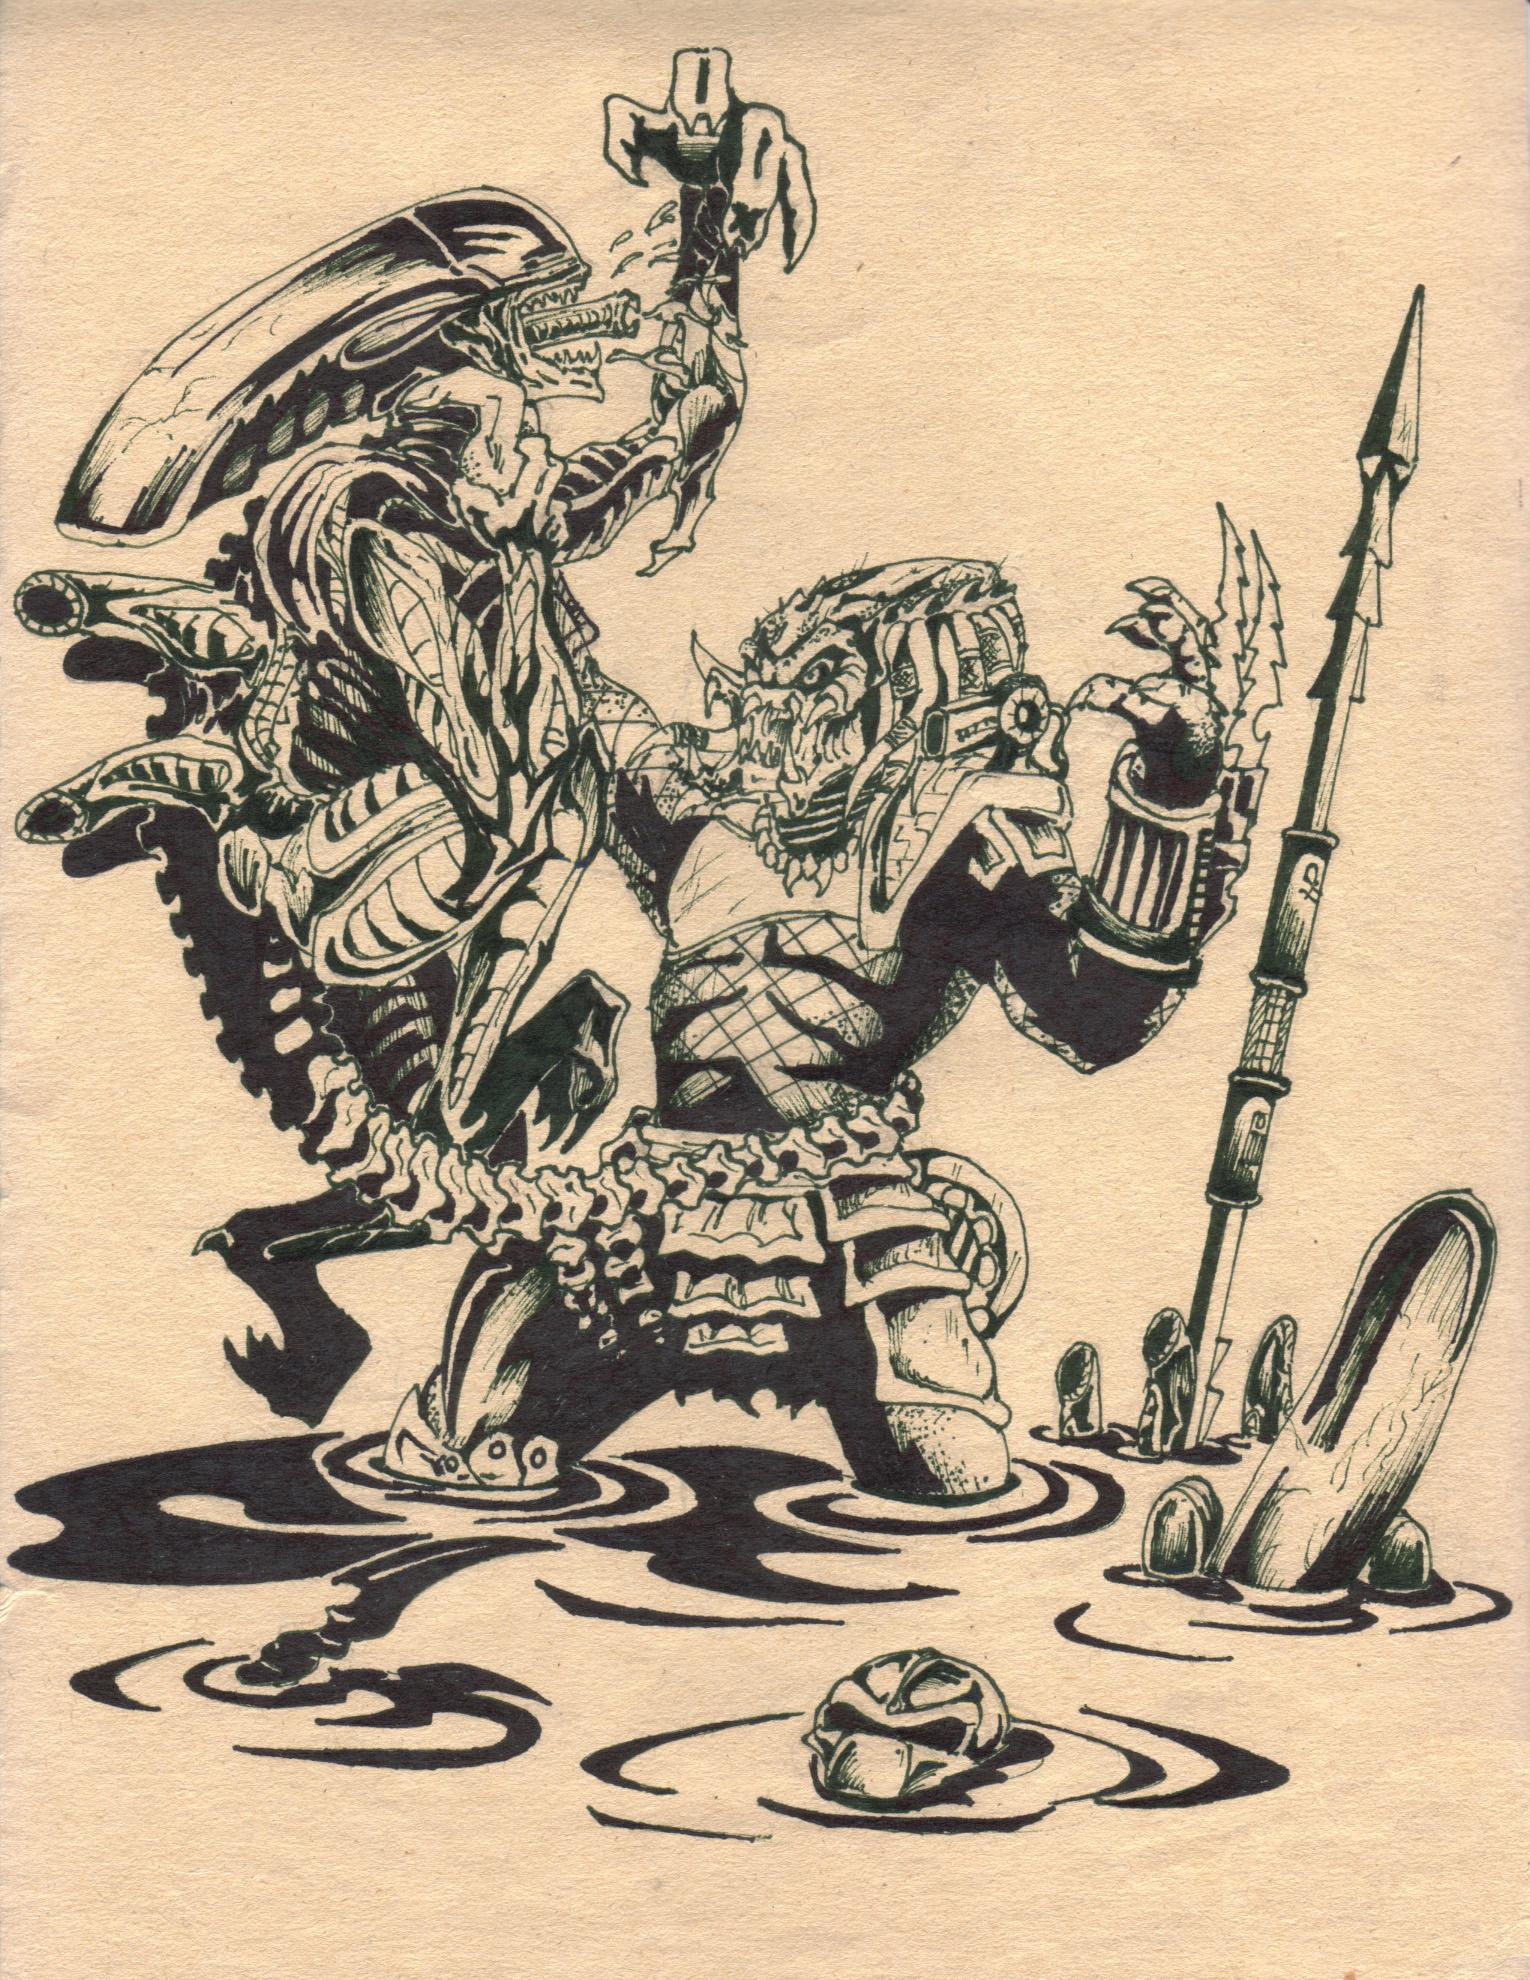 aliens vs predator drawings - photo #37